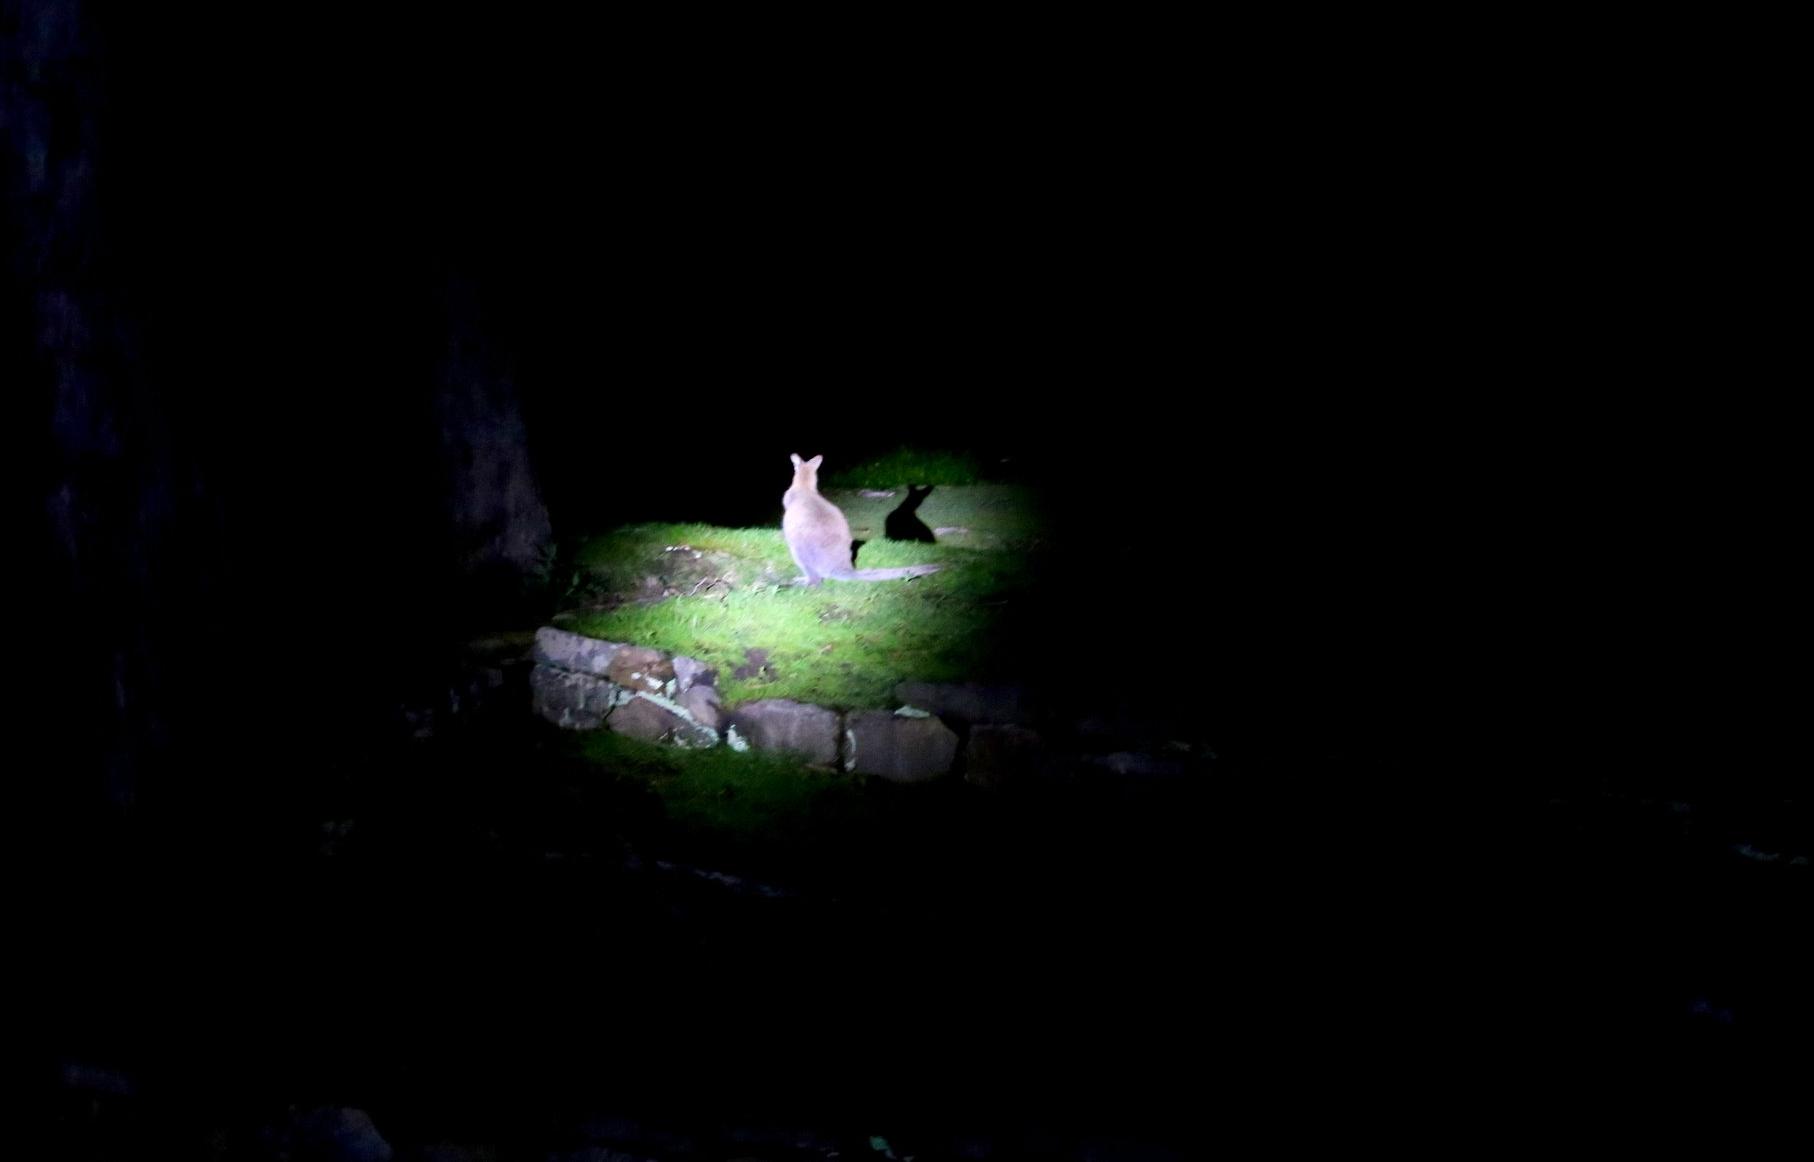 Wallaby in spotlight in Hobart, Tasmania.